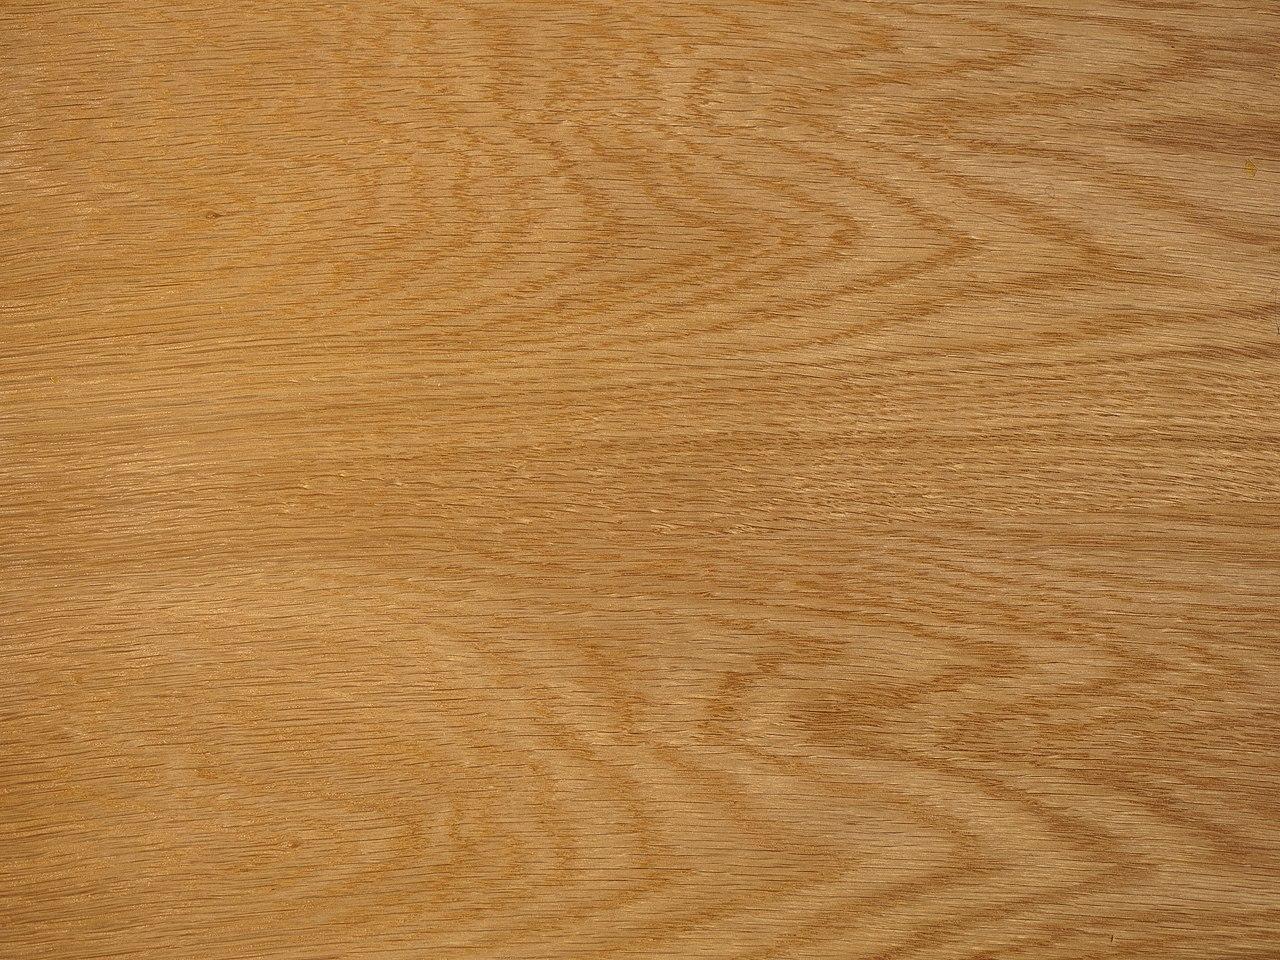 Oak Pine Furniture Llantrisant